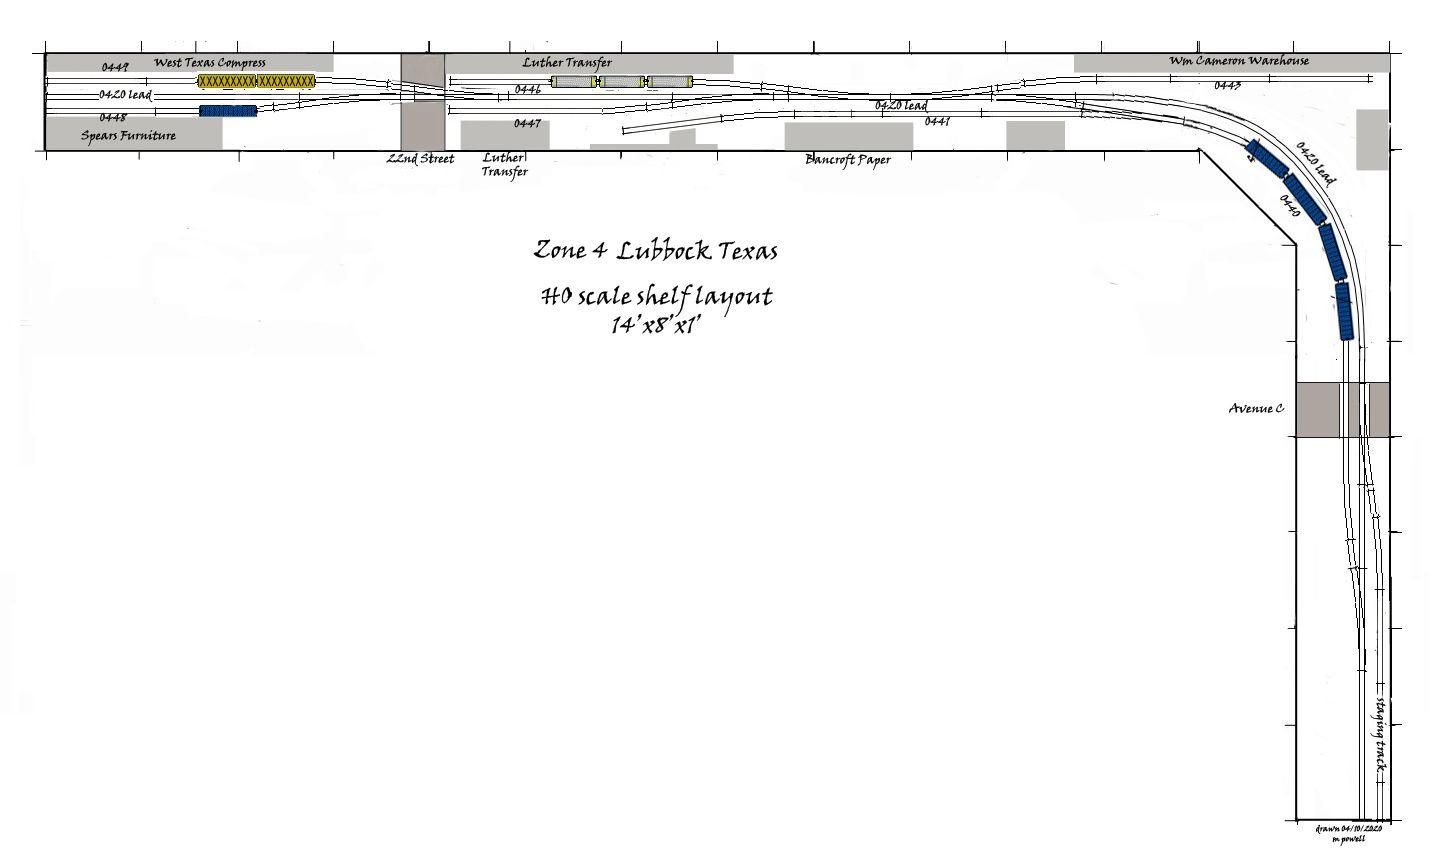 lubbock011.jpg 1,446×866 pixels Model railway track